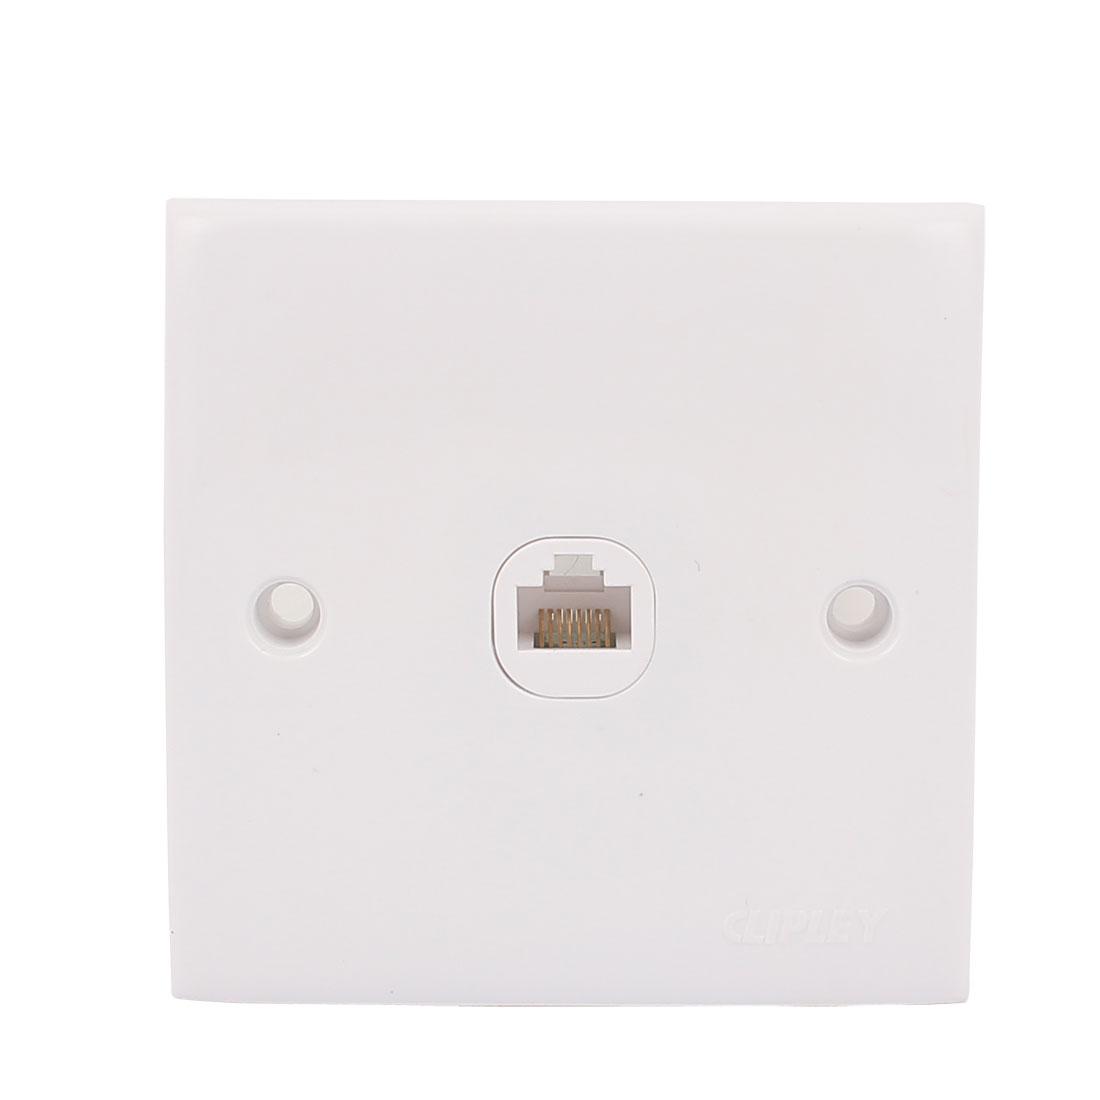 250V RJ45 Jack Port Coupler Ethernet Port Wall Plate Outlet Female Socket White